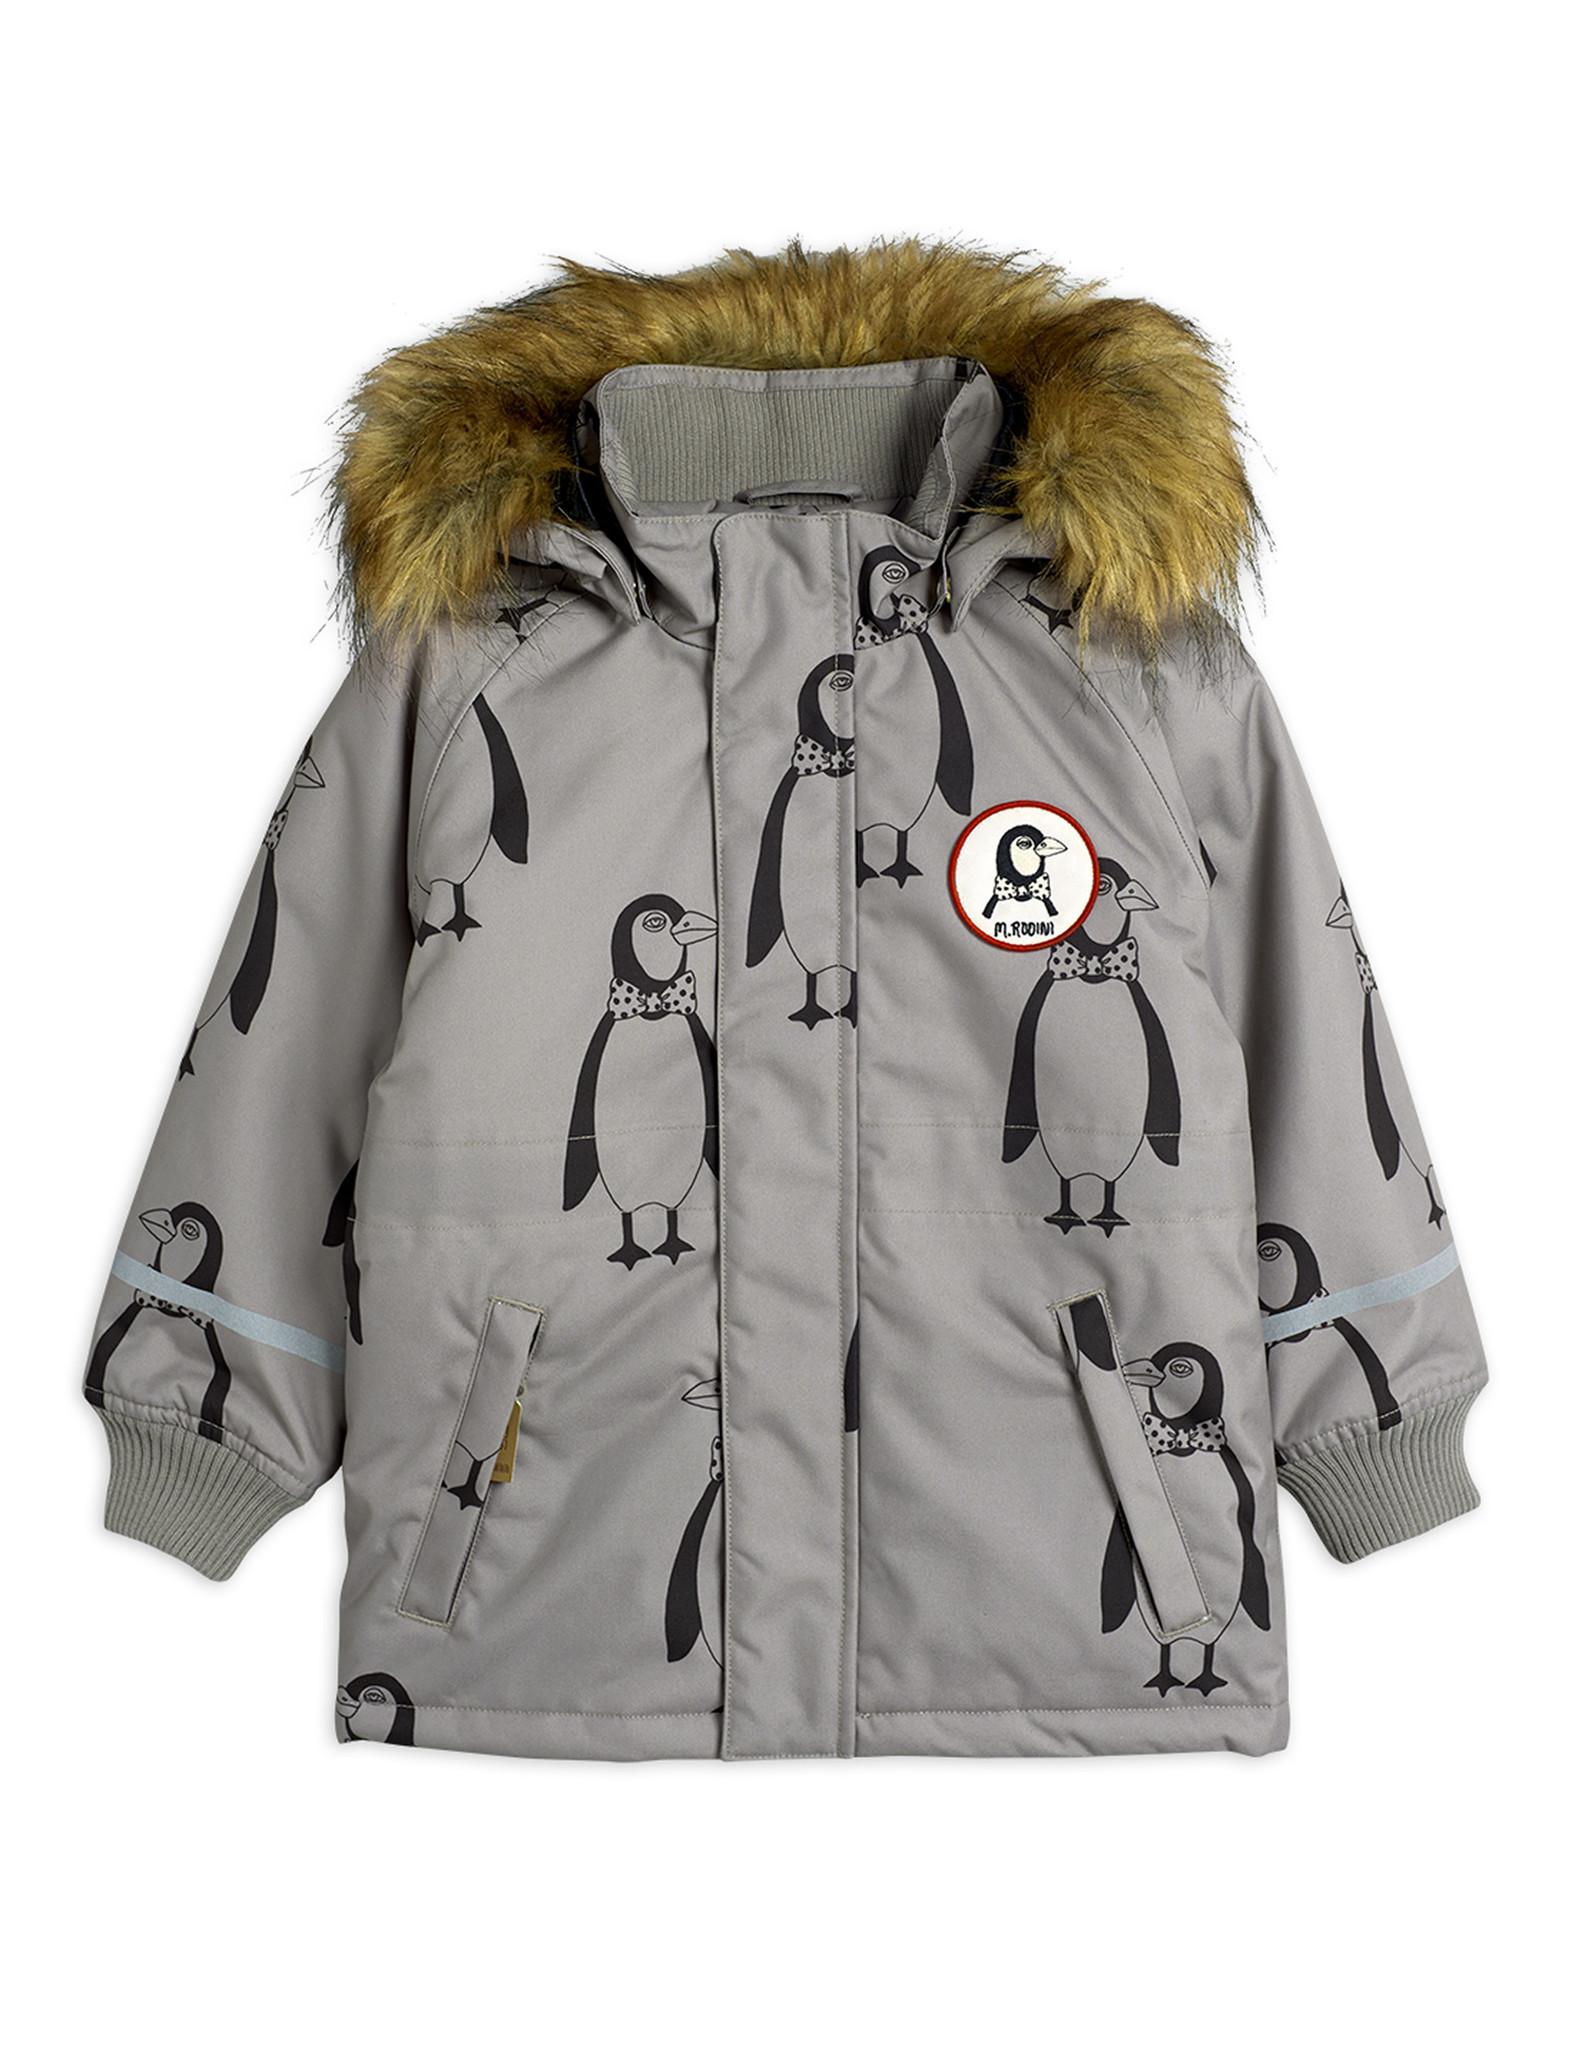 K2 penguin parka - Grey-1